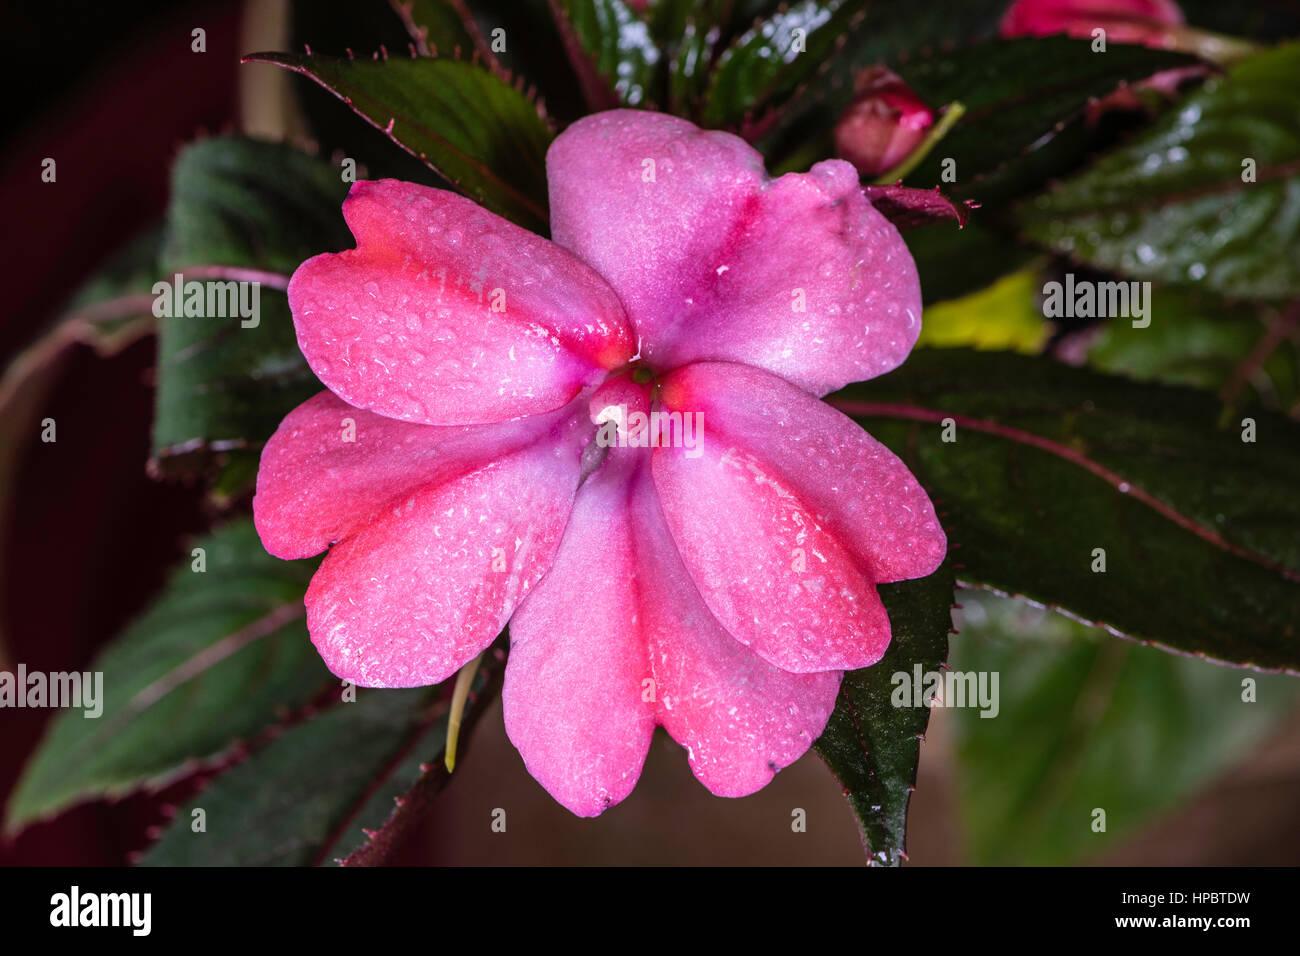 Dianthus Flowers Stock Photos Dianthus Flowers Stock Images Alamy